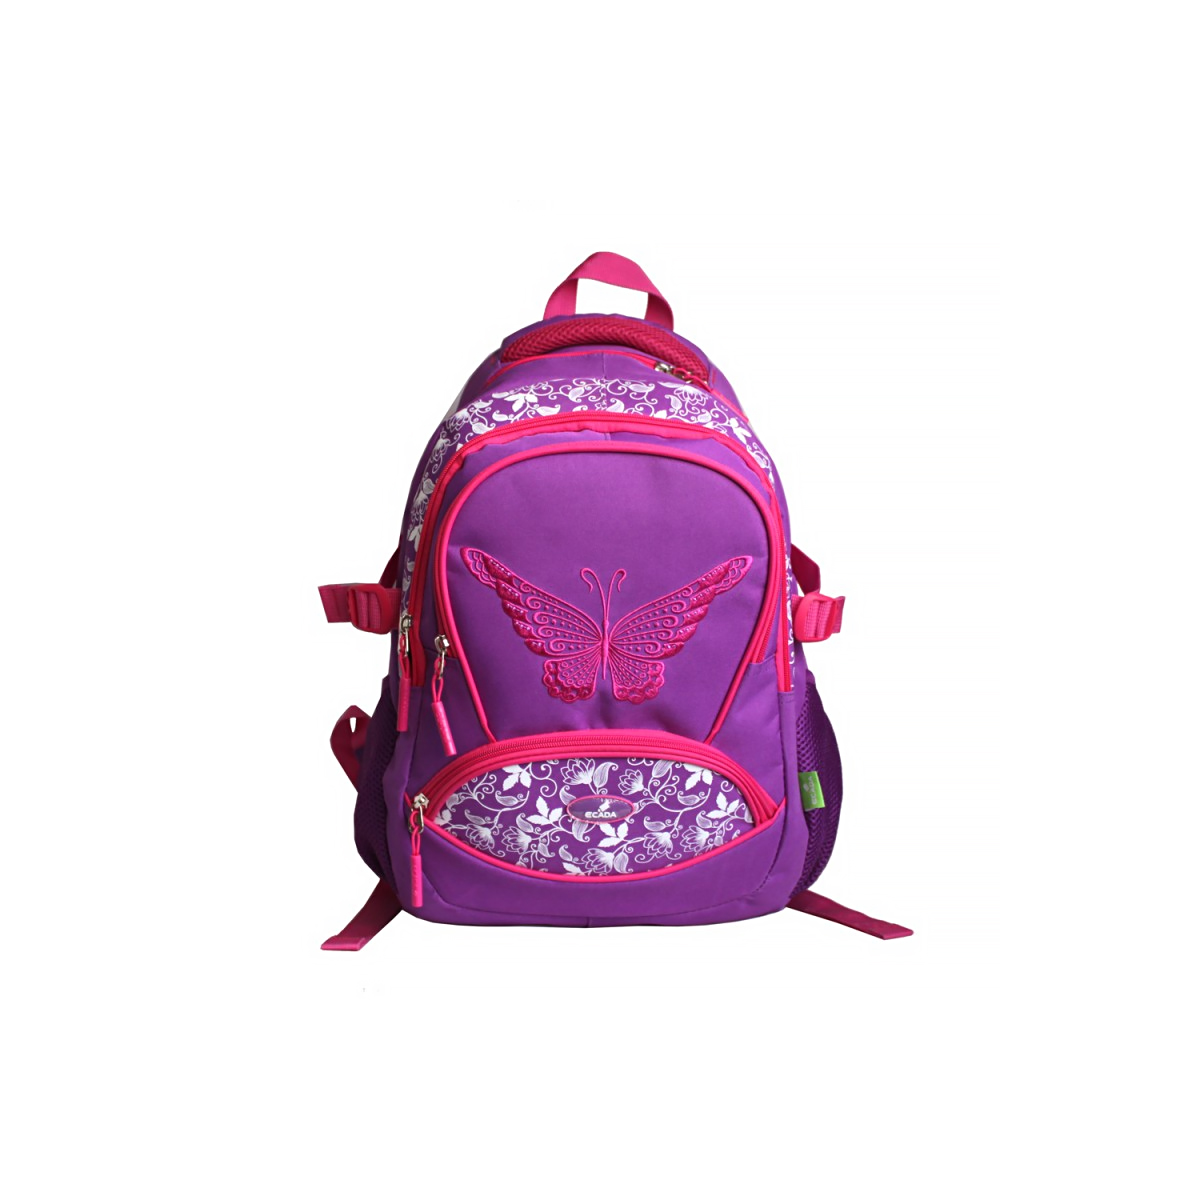 Ghiozdan Școlar Pentru Adolescenți, 46 Centimetri, Mov & Roz, Fluture, Ecada, 61714